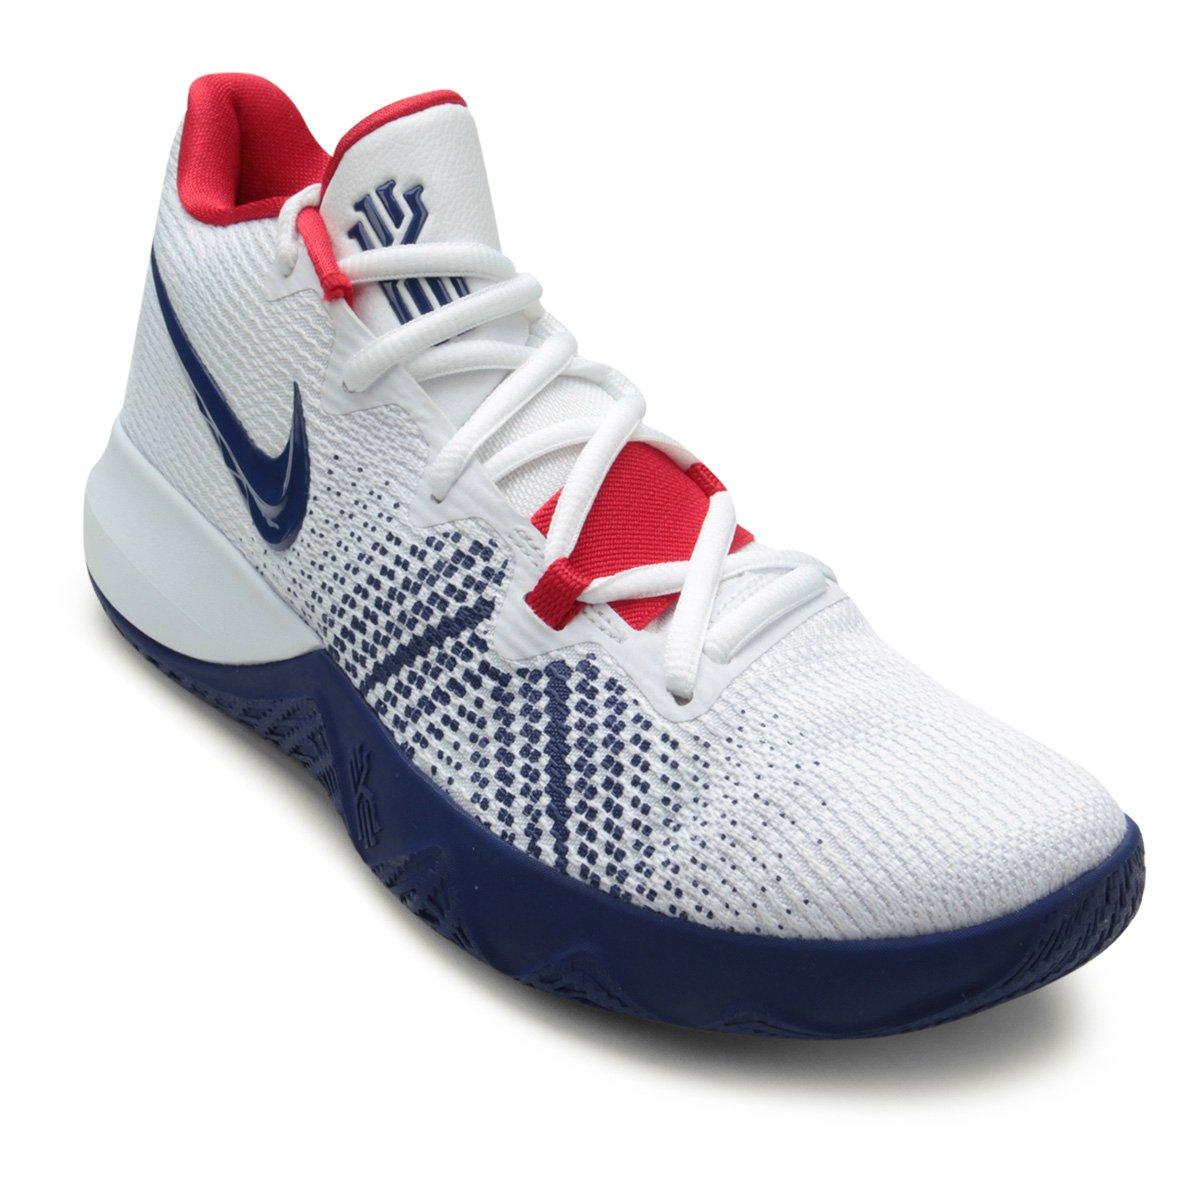 Tênis Nike Kyrie Flytrap Masculino - Branco e Azul - Compre Agora ... 3ff542146f5ac